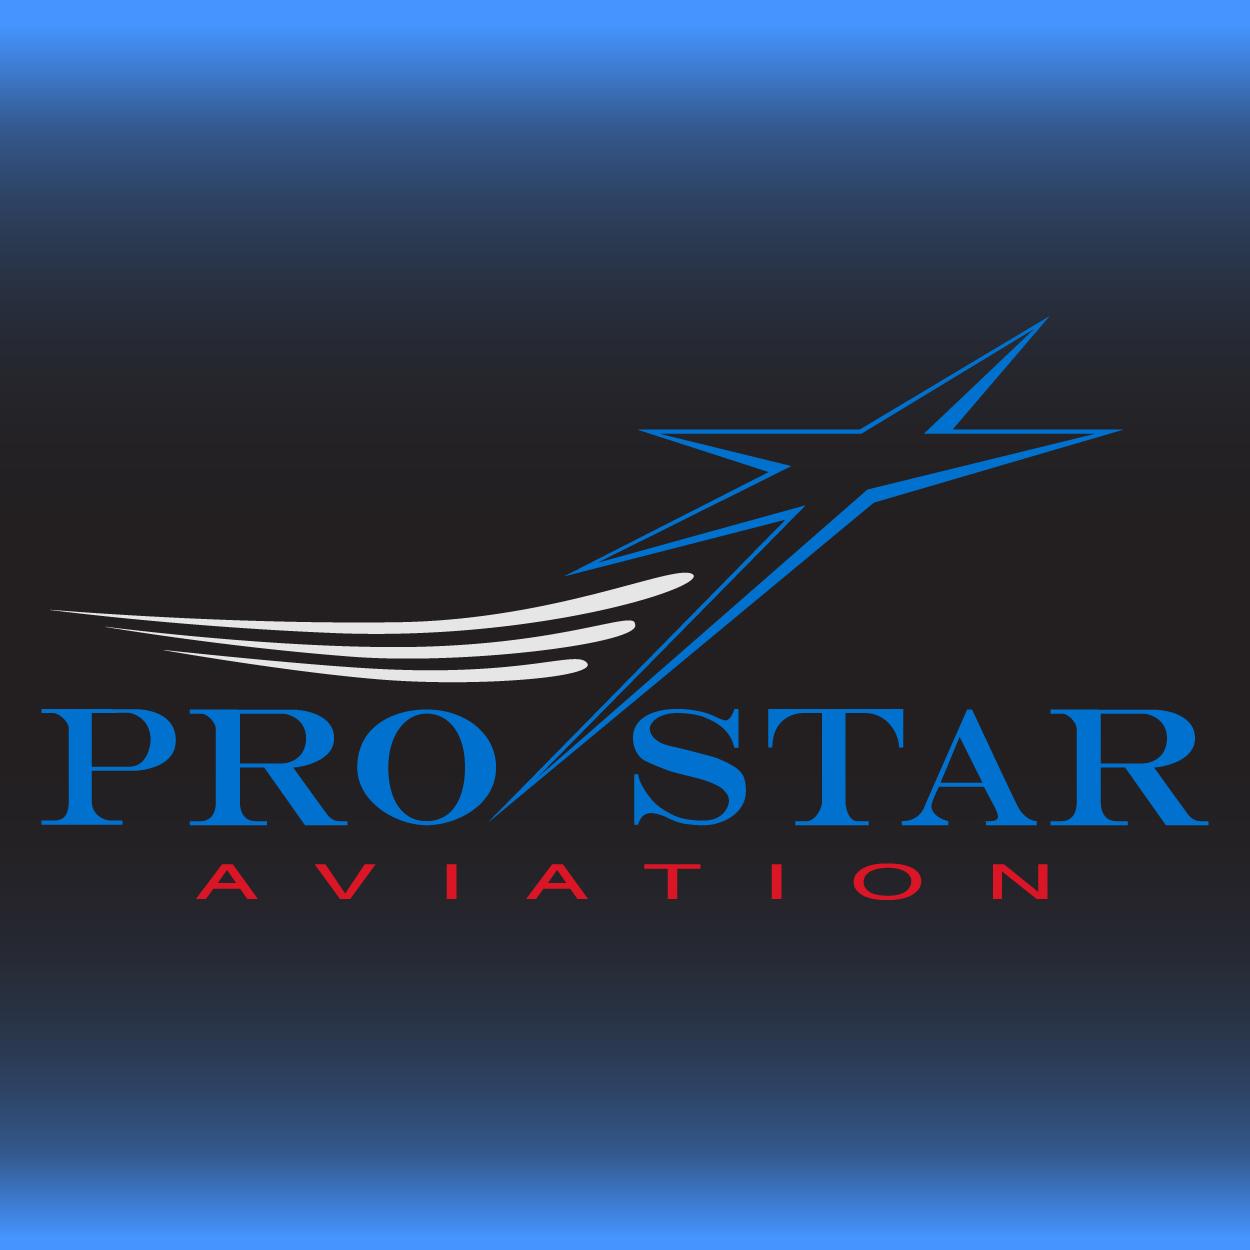 Jobs Pro Star Aviation Blue Electric Llc